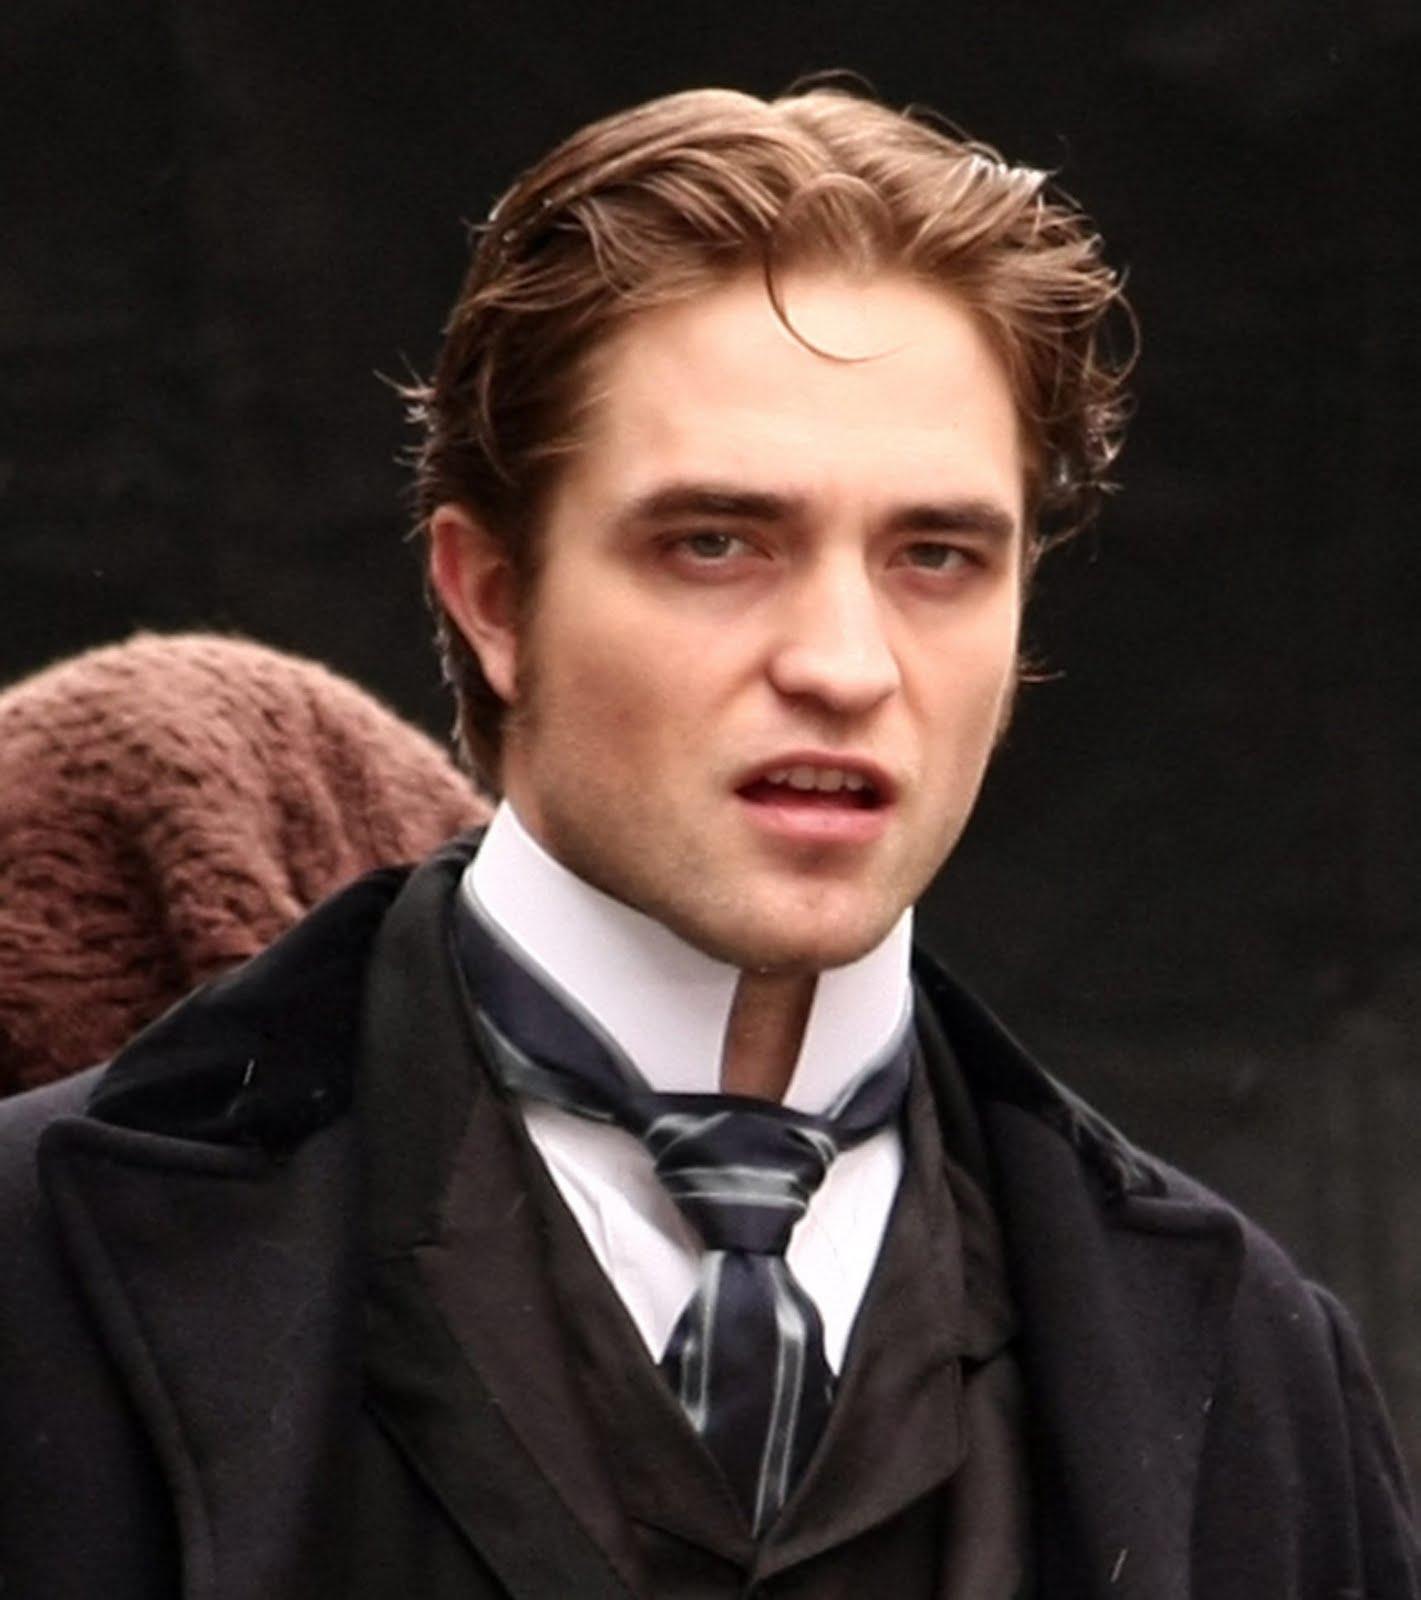 Model Talks About 'Bel Ami' Sex Scene With Robert Pattinson